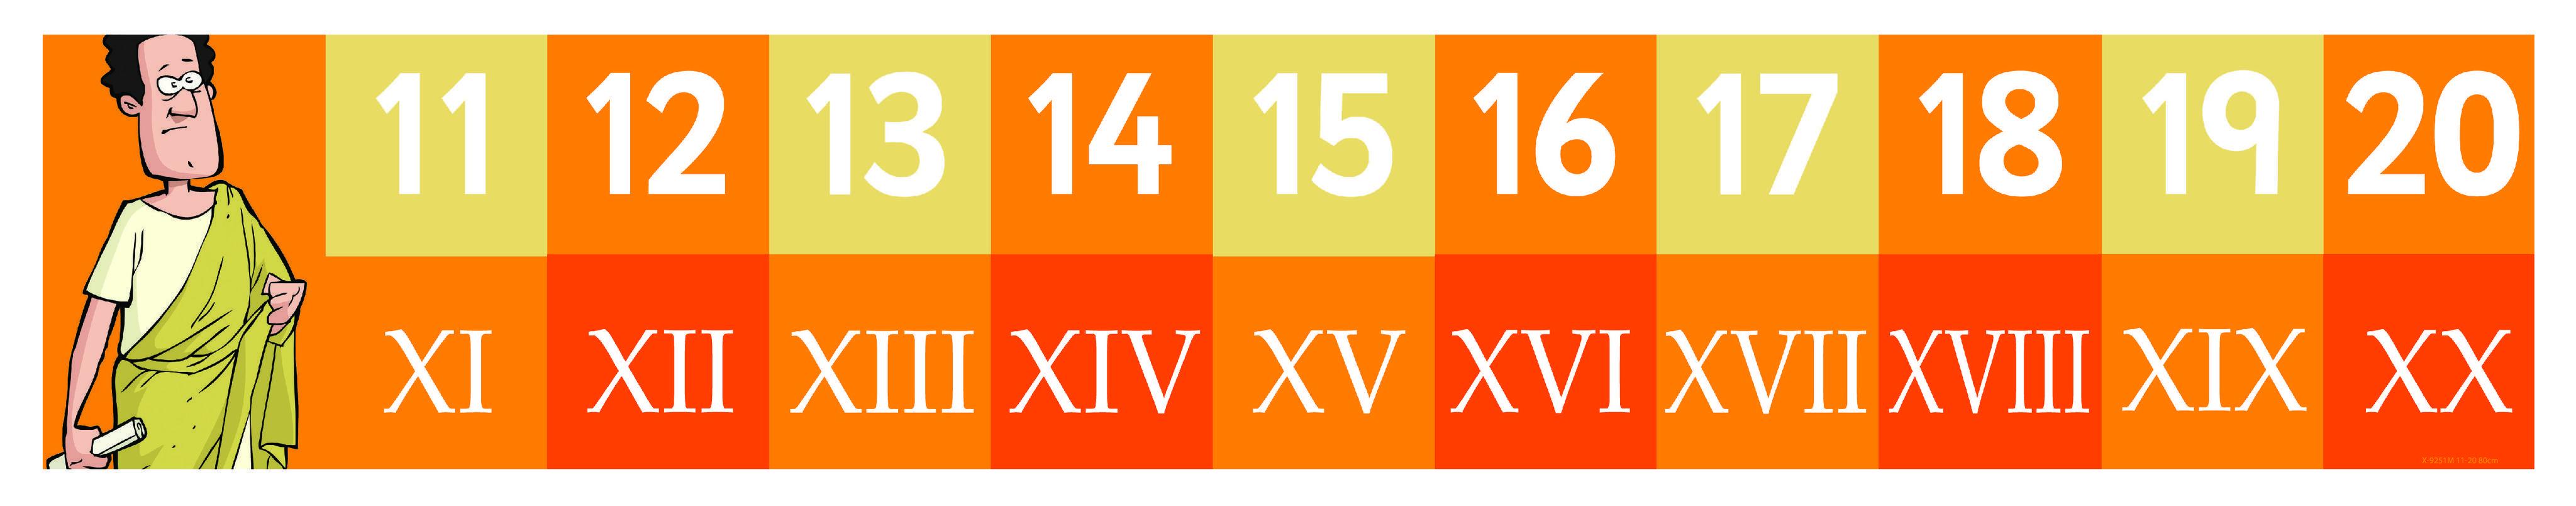 1 20 to numerals roman Printable Roman